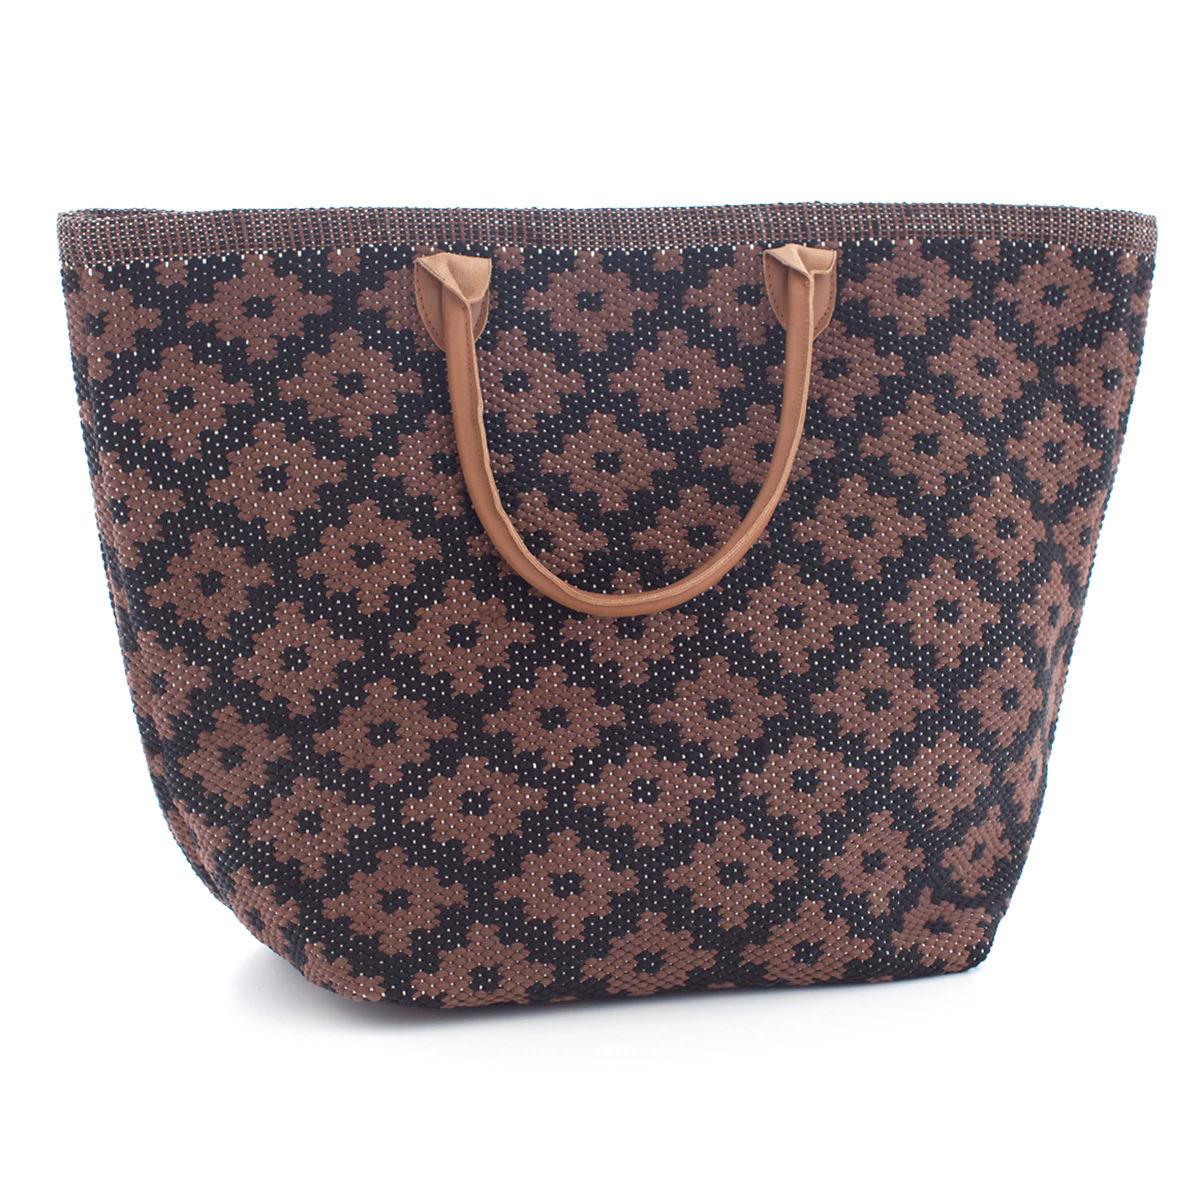 Fresh American Le Tote Black/Brown Tote Bag Grand